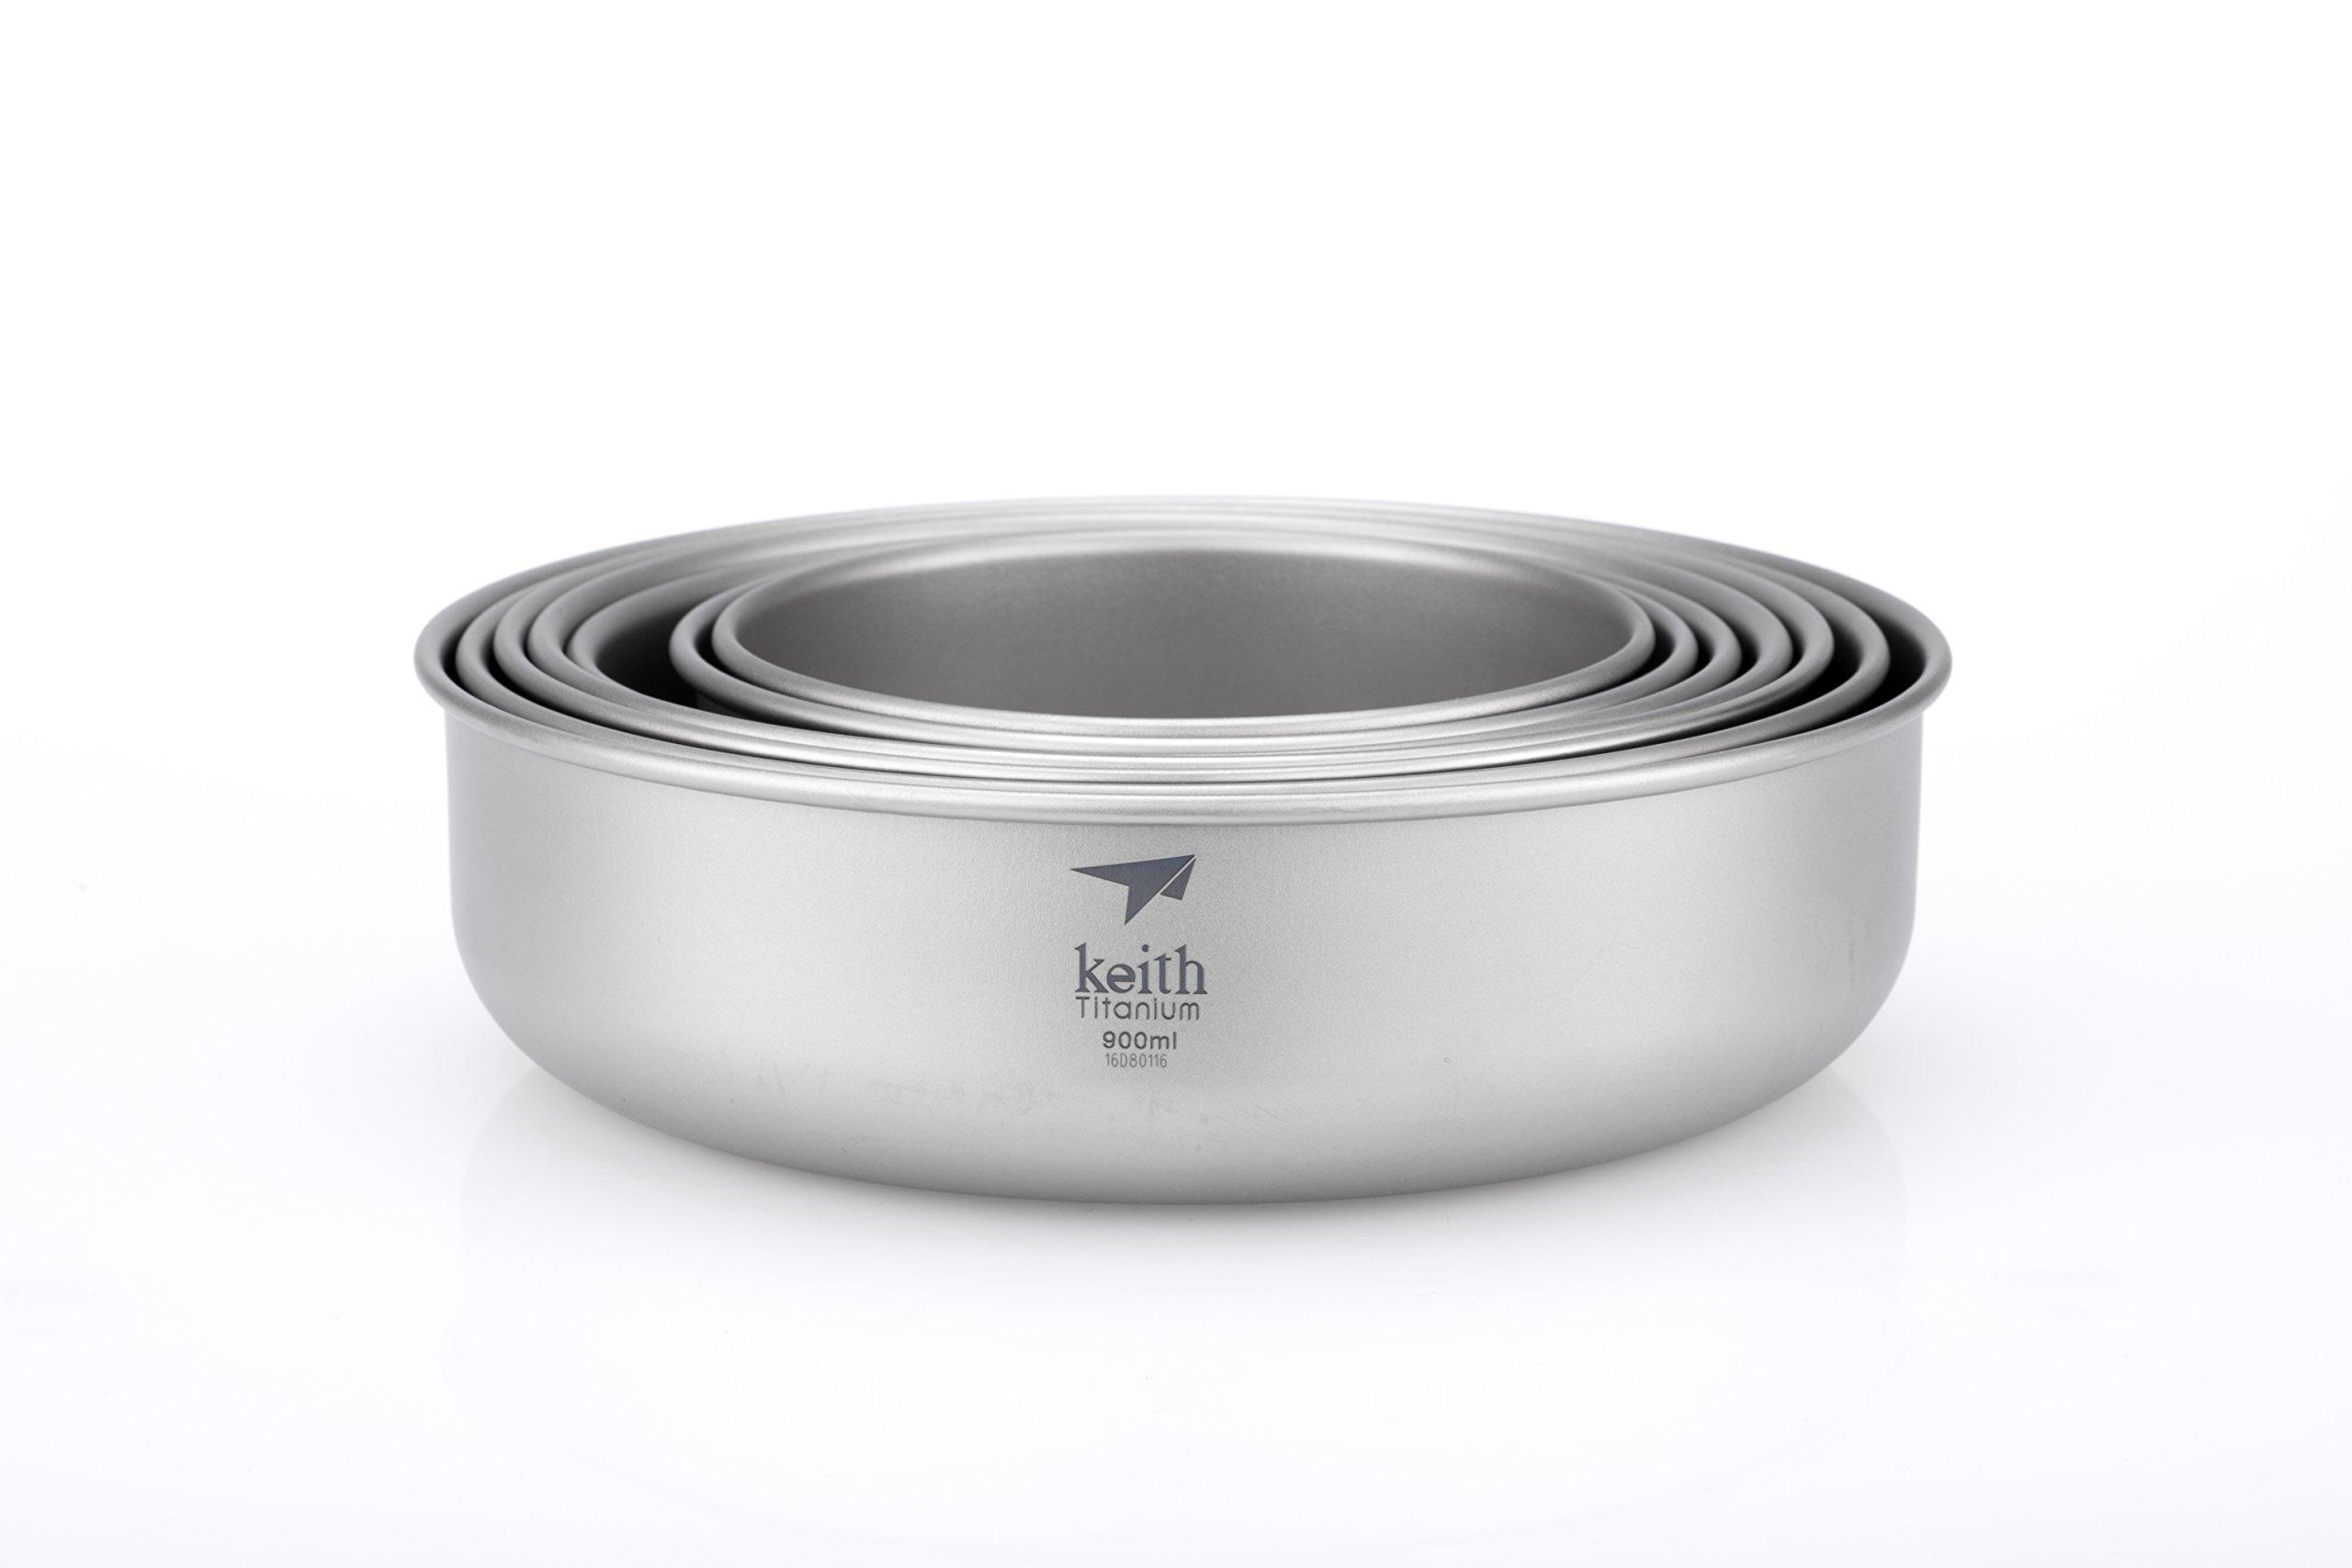 Keith Titanium Ti5375 7-Piece Bowl Set by Keith Titanium